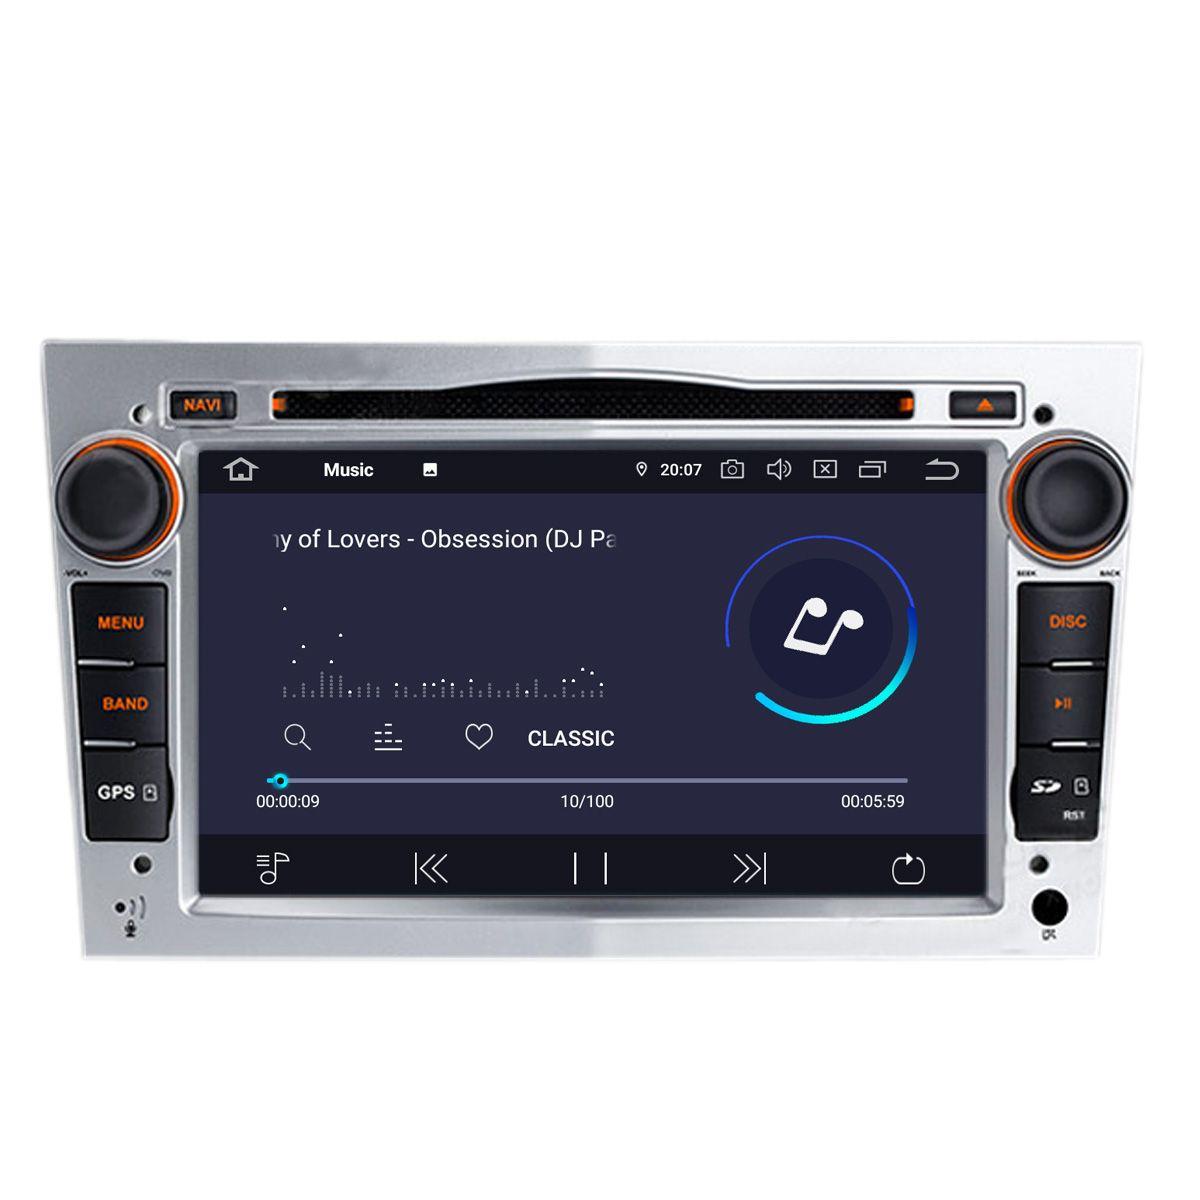 Autocardvdgps coika 7 quad core android 9.0 auto car dvd gps navi for opel astra vectra  zafira antara vivaro radio rds wifi 4g obd dvr 3d map 4k video car dvd